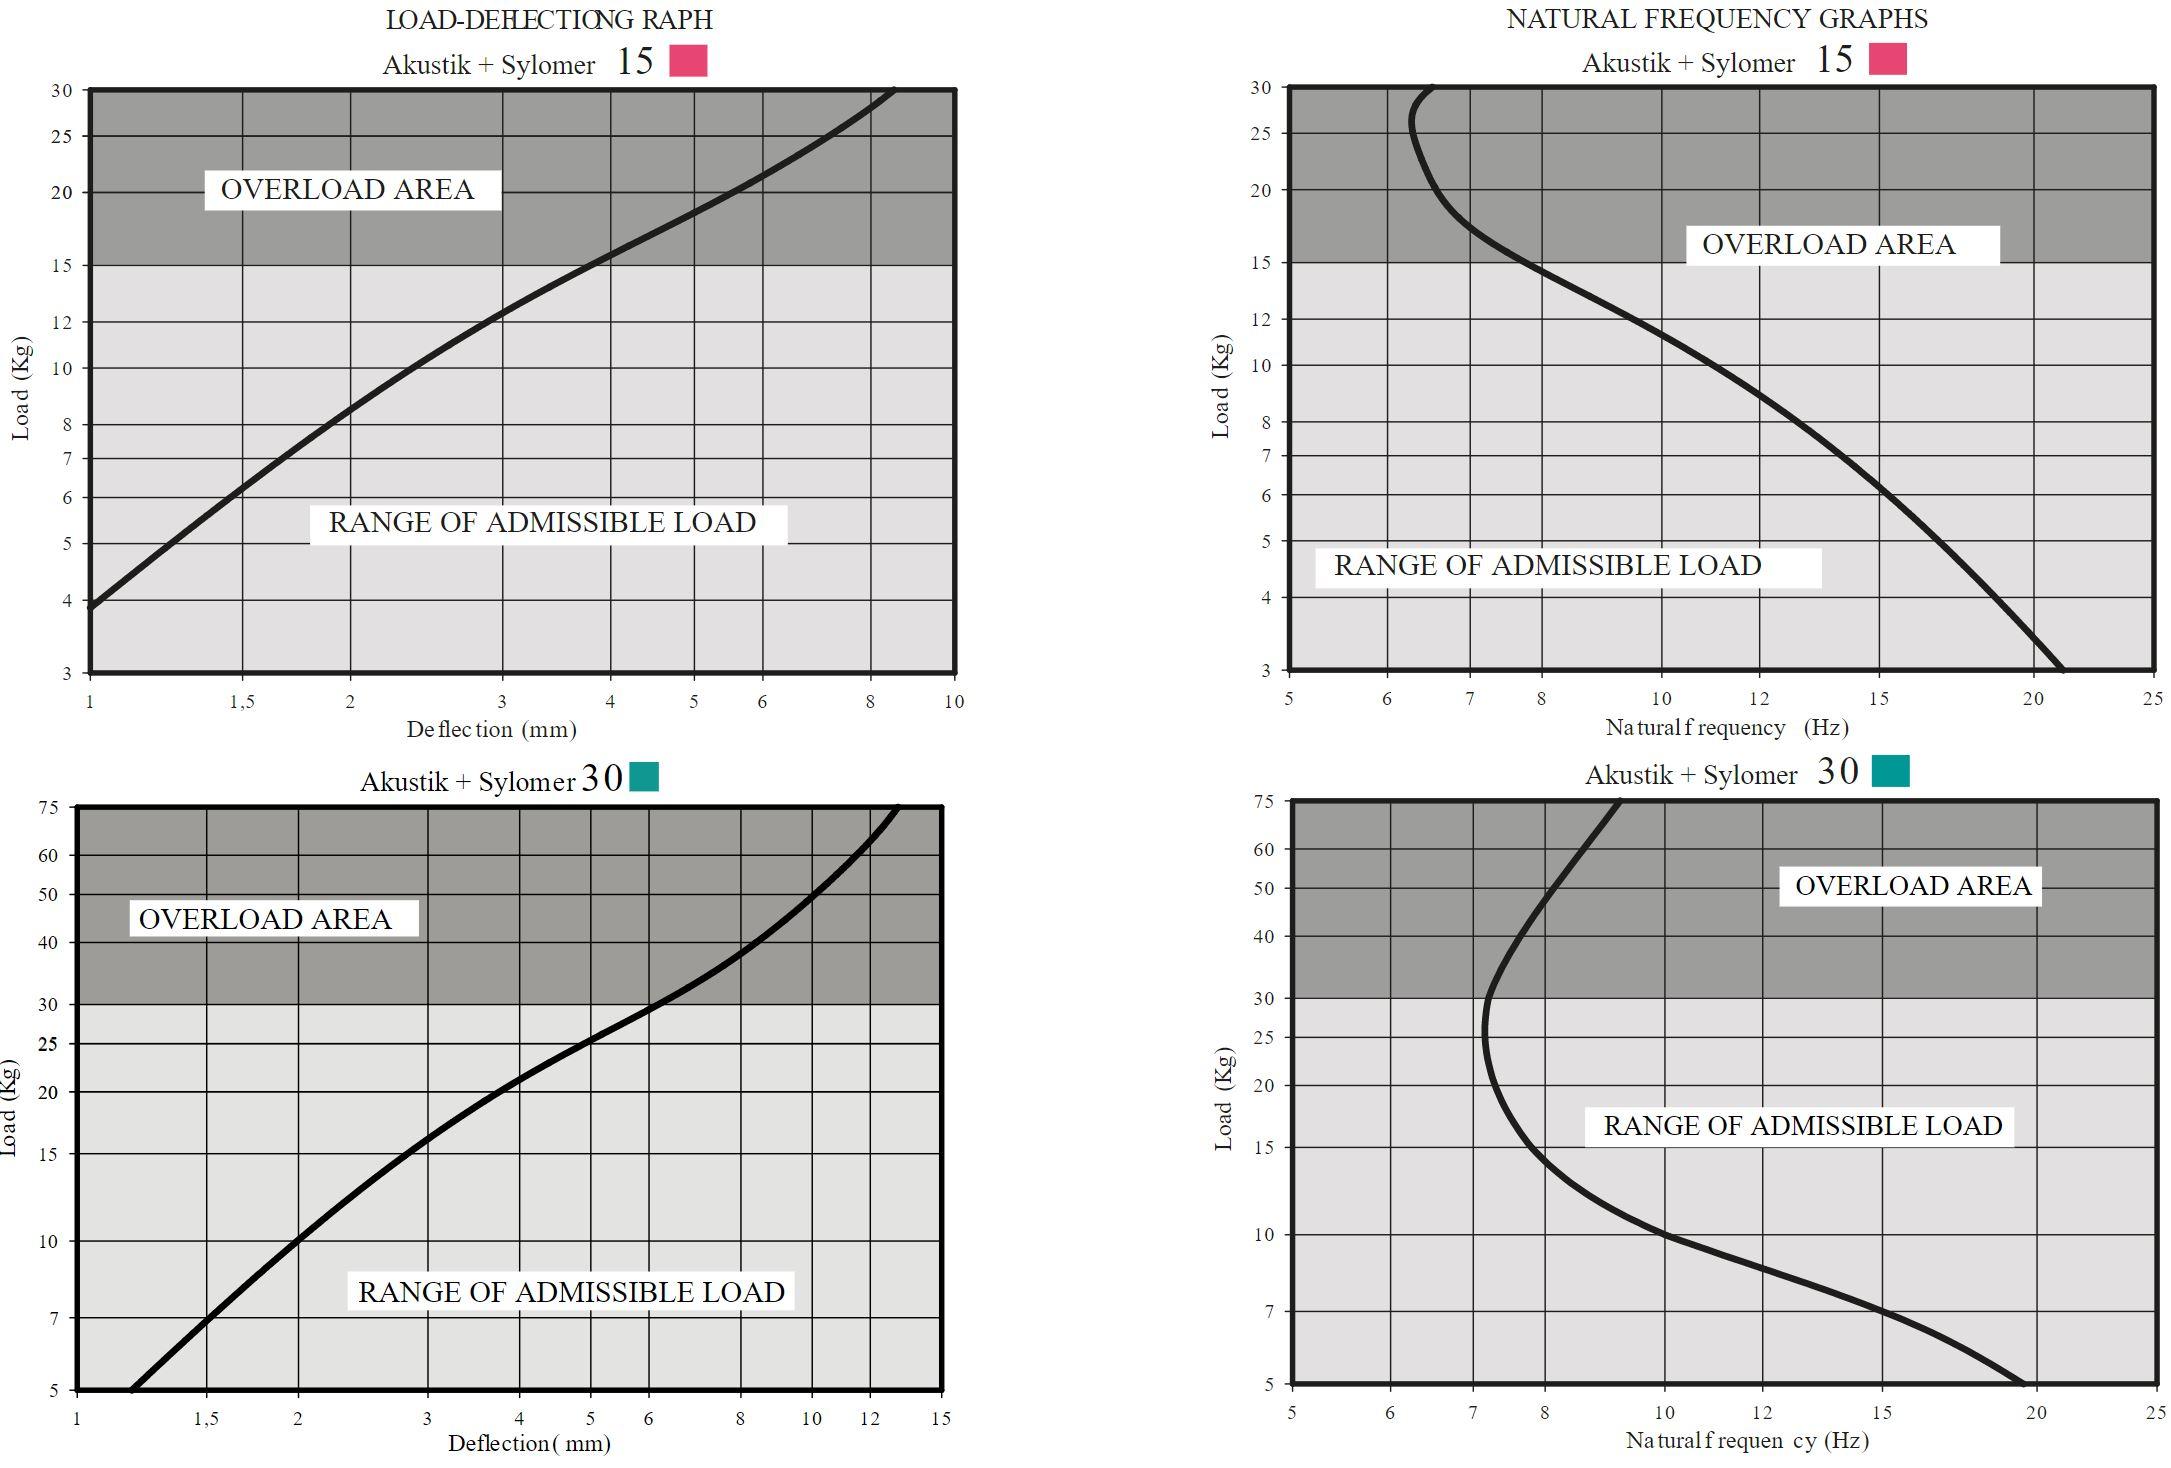 Akustik BG Nonius + Sylomer Curve 1